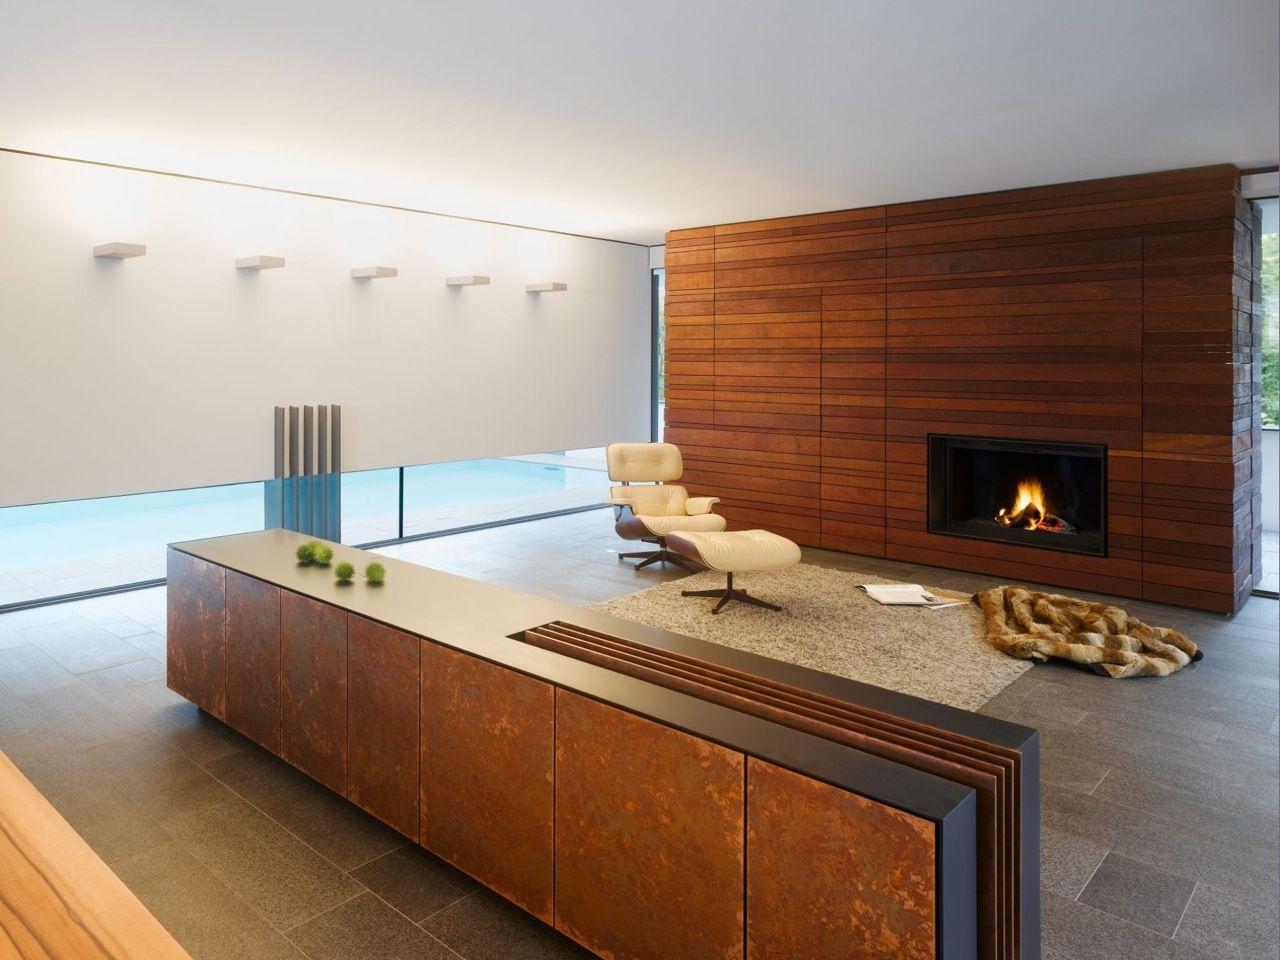 House-Heidehof-10